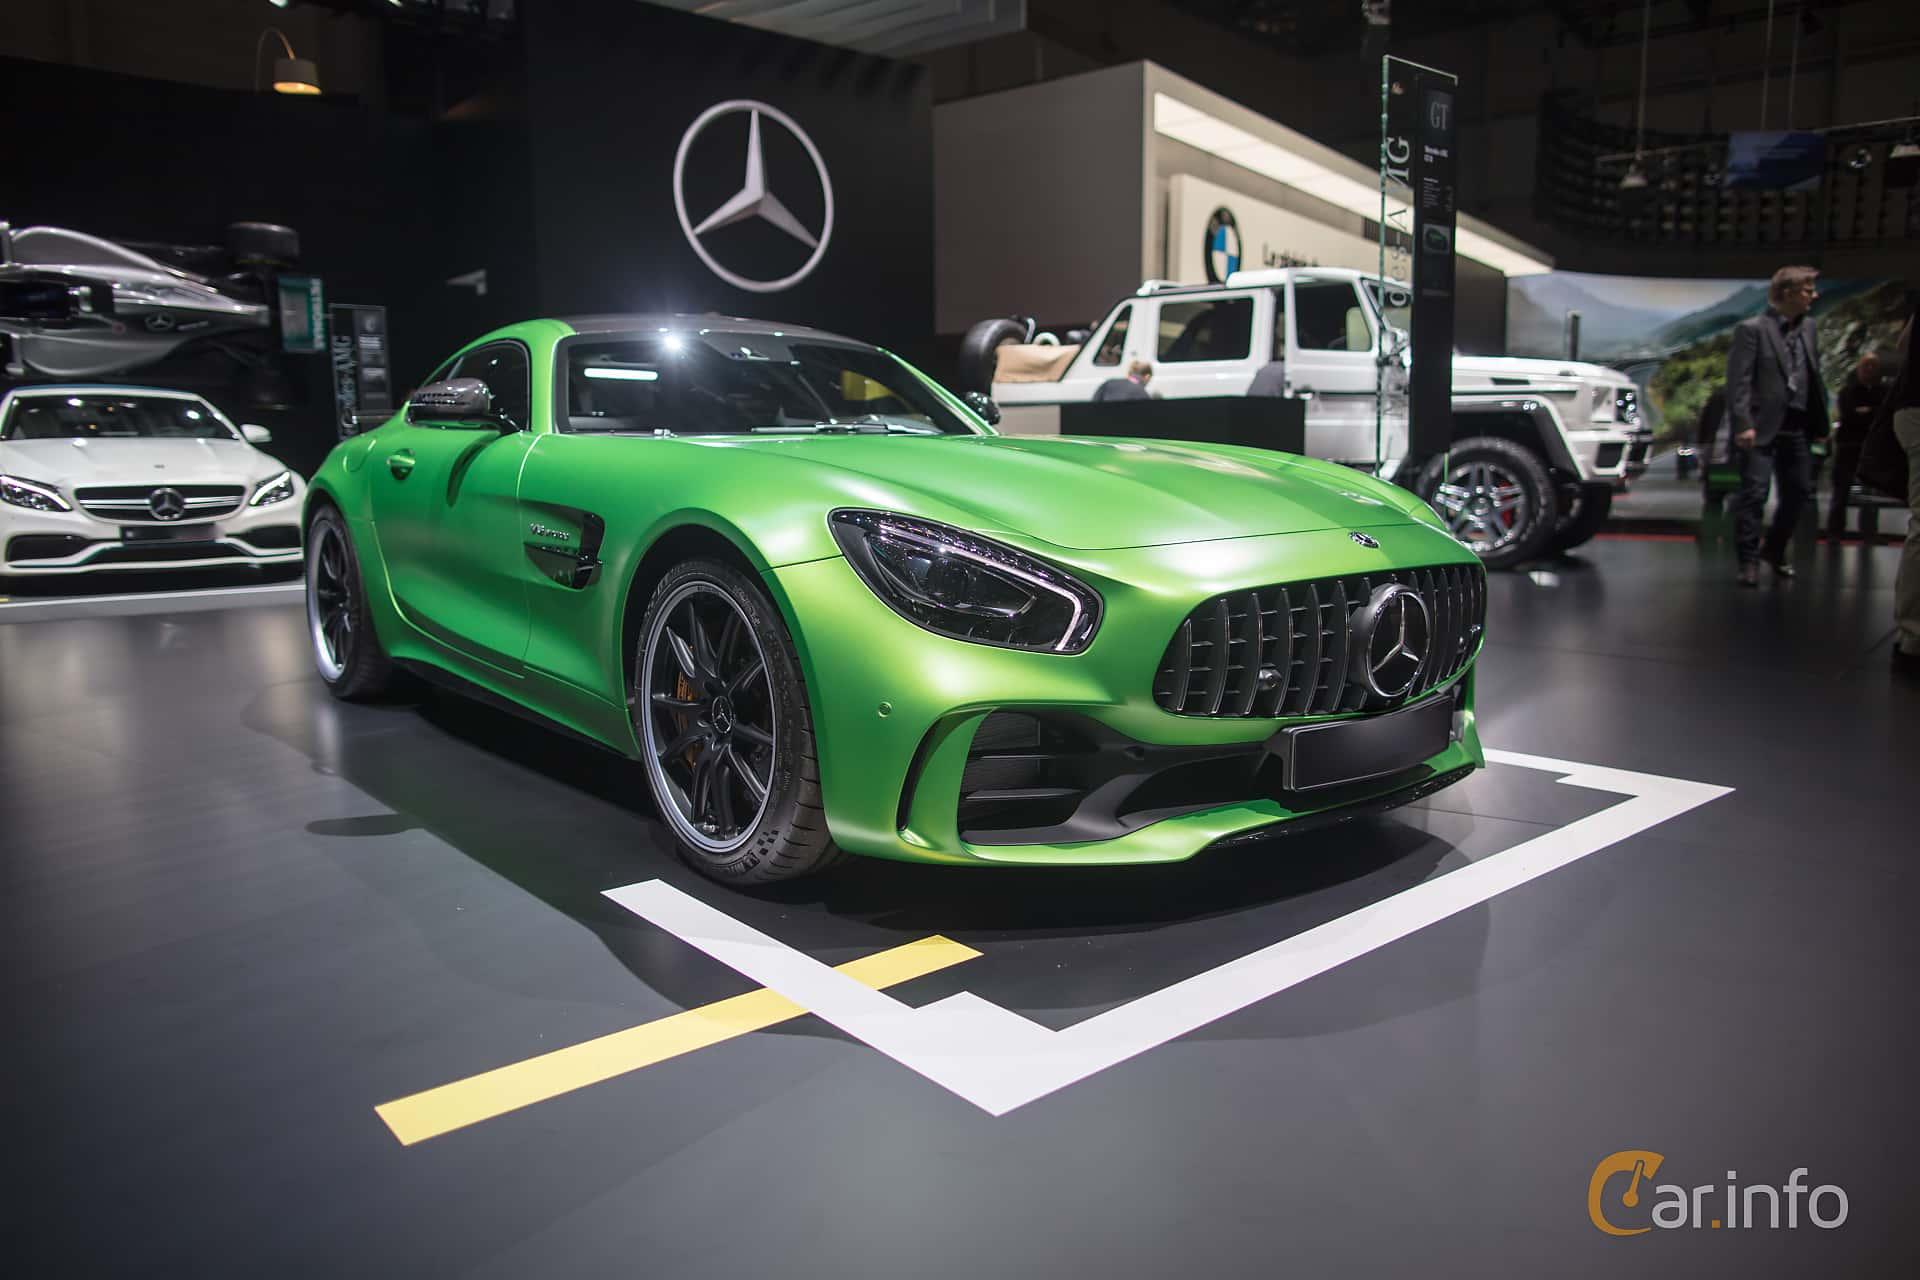 Mercedes-Benz AMG GT R  AMG Speedshift DCT, 585hp, 2017 at Geneva Motor Show 2017